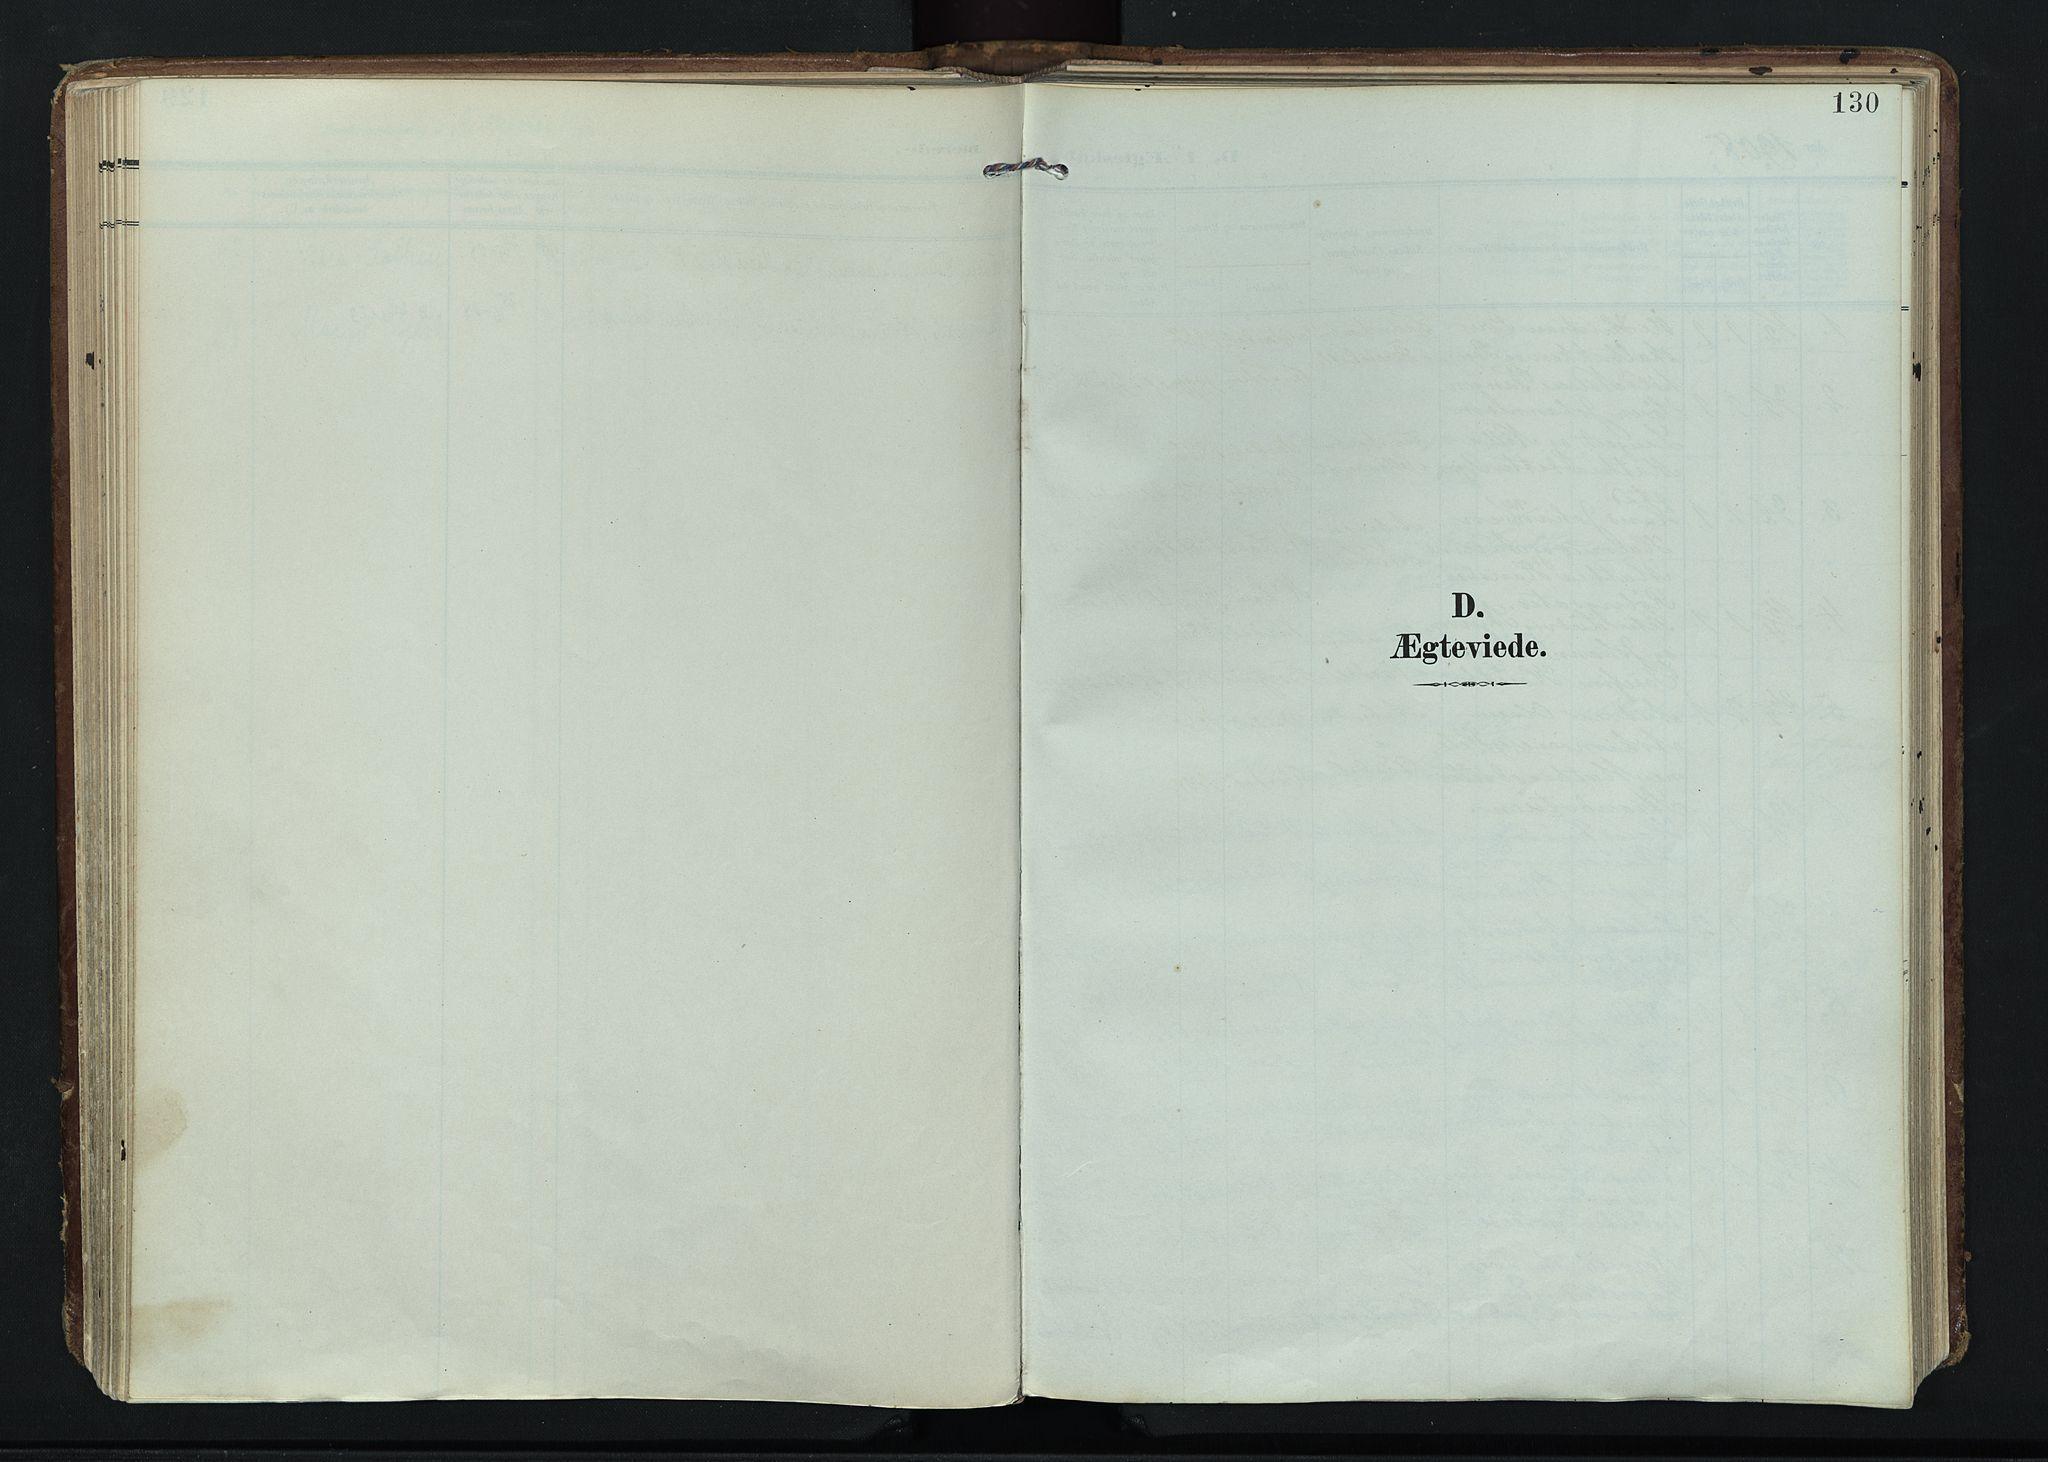 SAH, Vardal prestekontor, H/Ha/Haa/L0020: Ministerialbok nr. 20, 1907-1921, s. 130